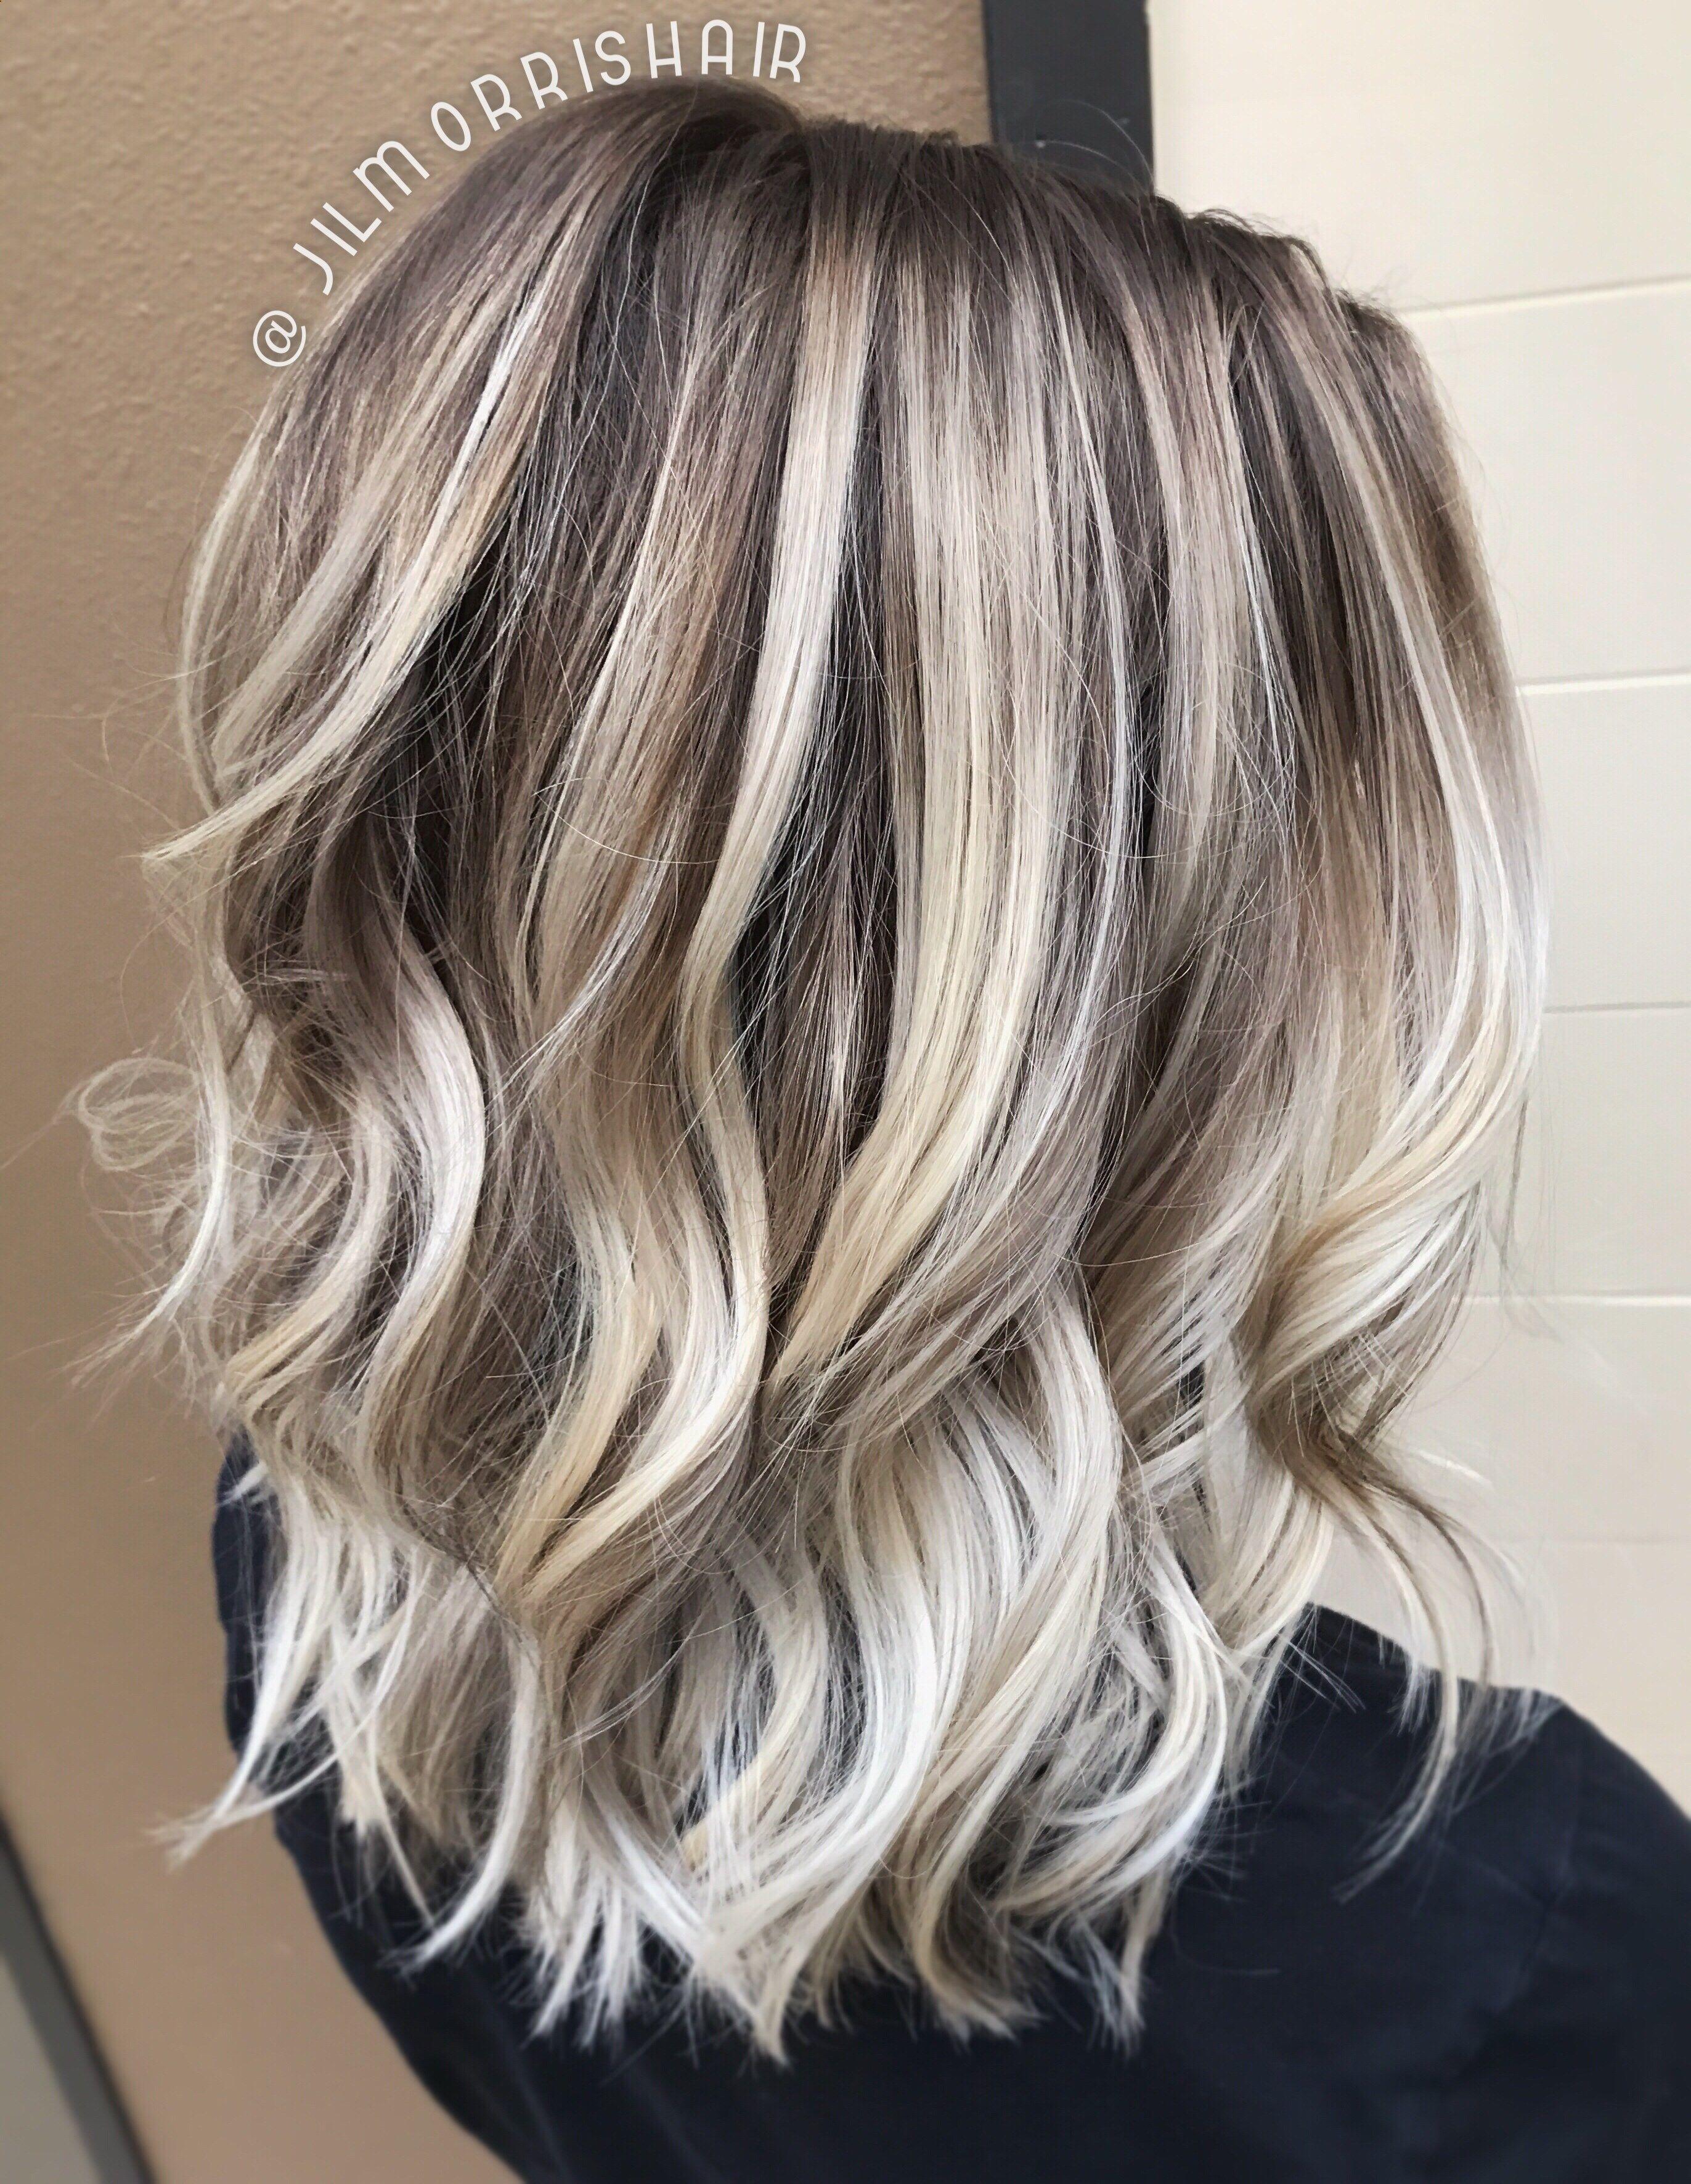 Hair Highlights Cool icy ashy blonde balayage highlights shadow